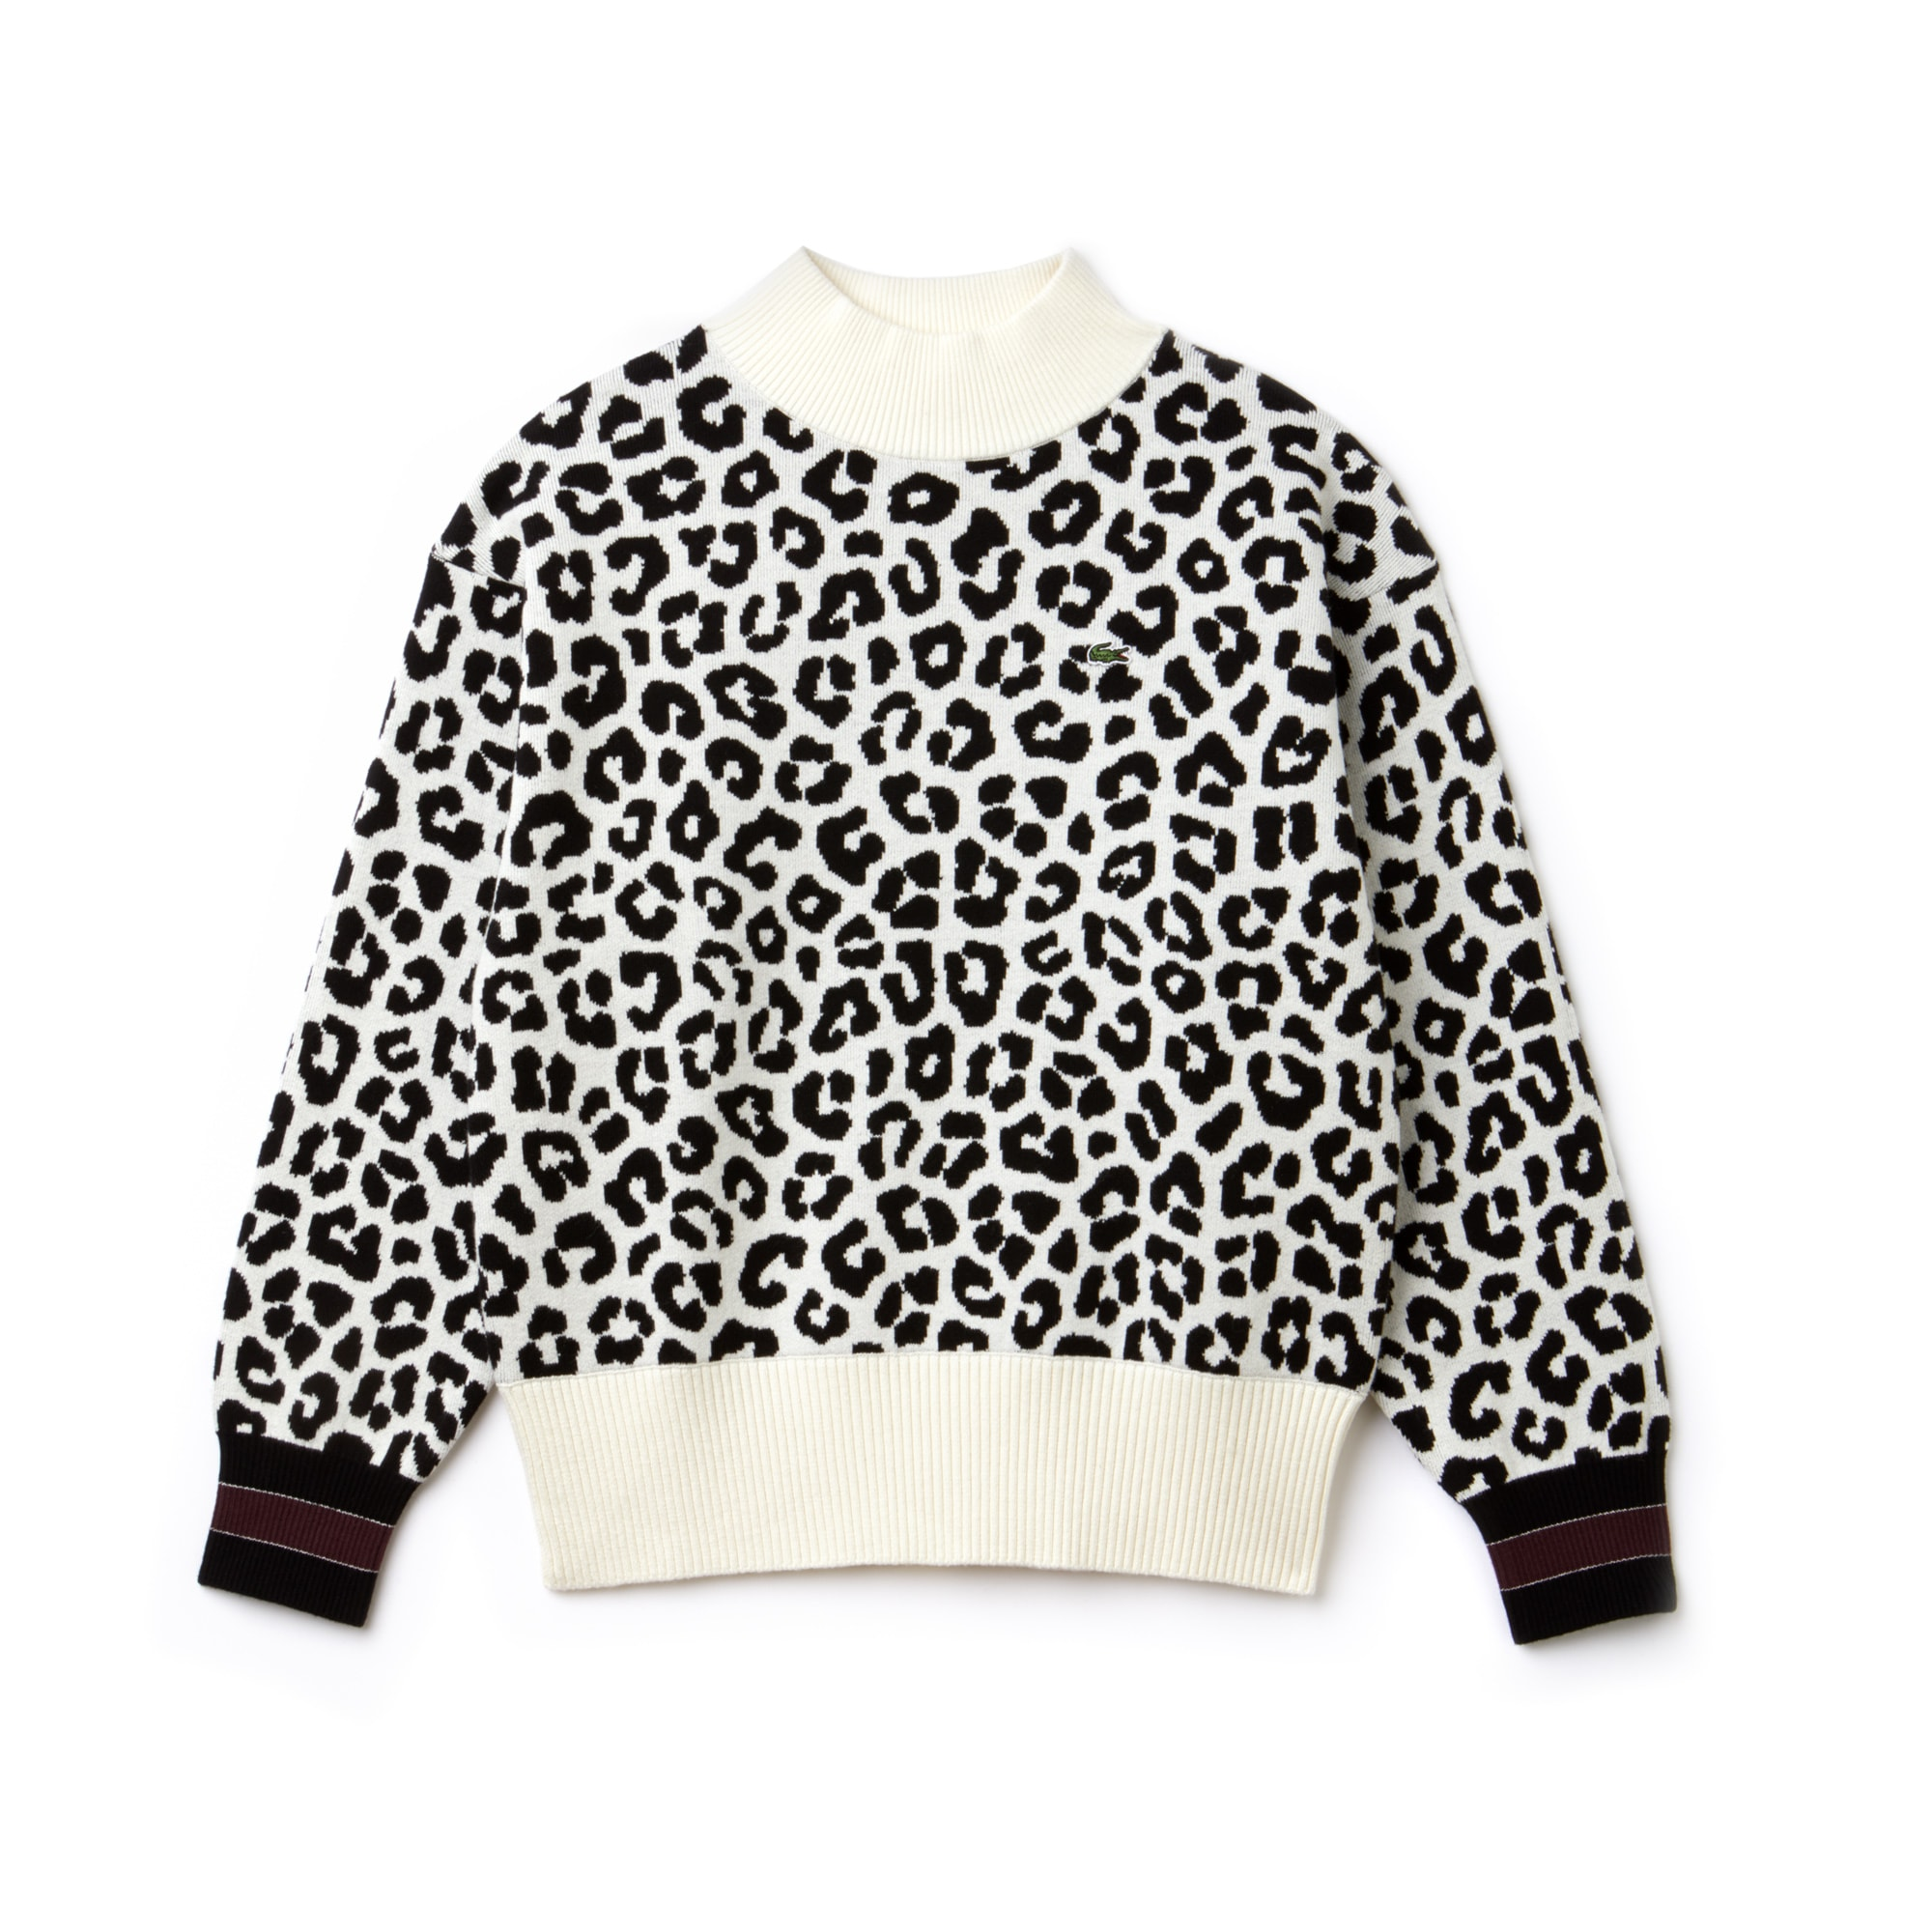 Lacoste Live系列女士豹纹印花提花织物毛衣